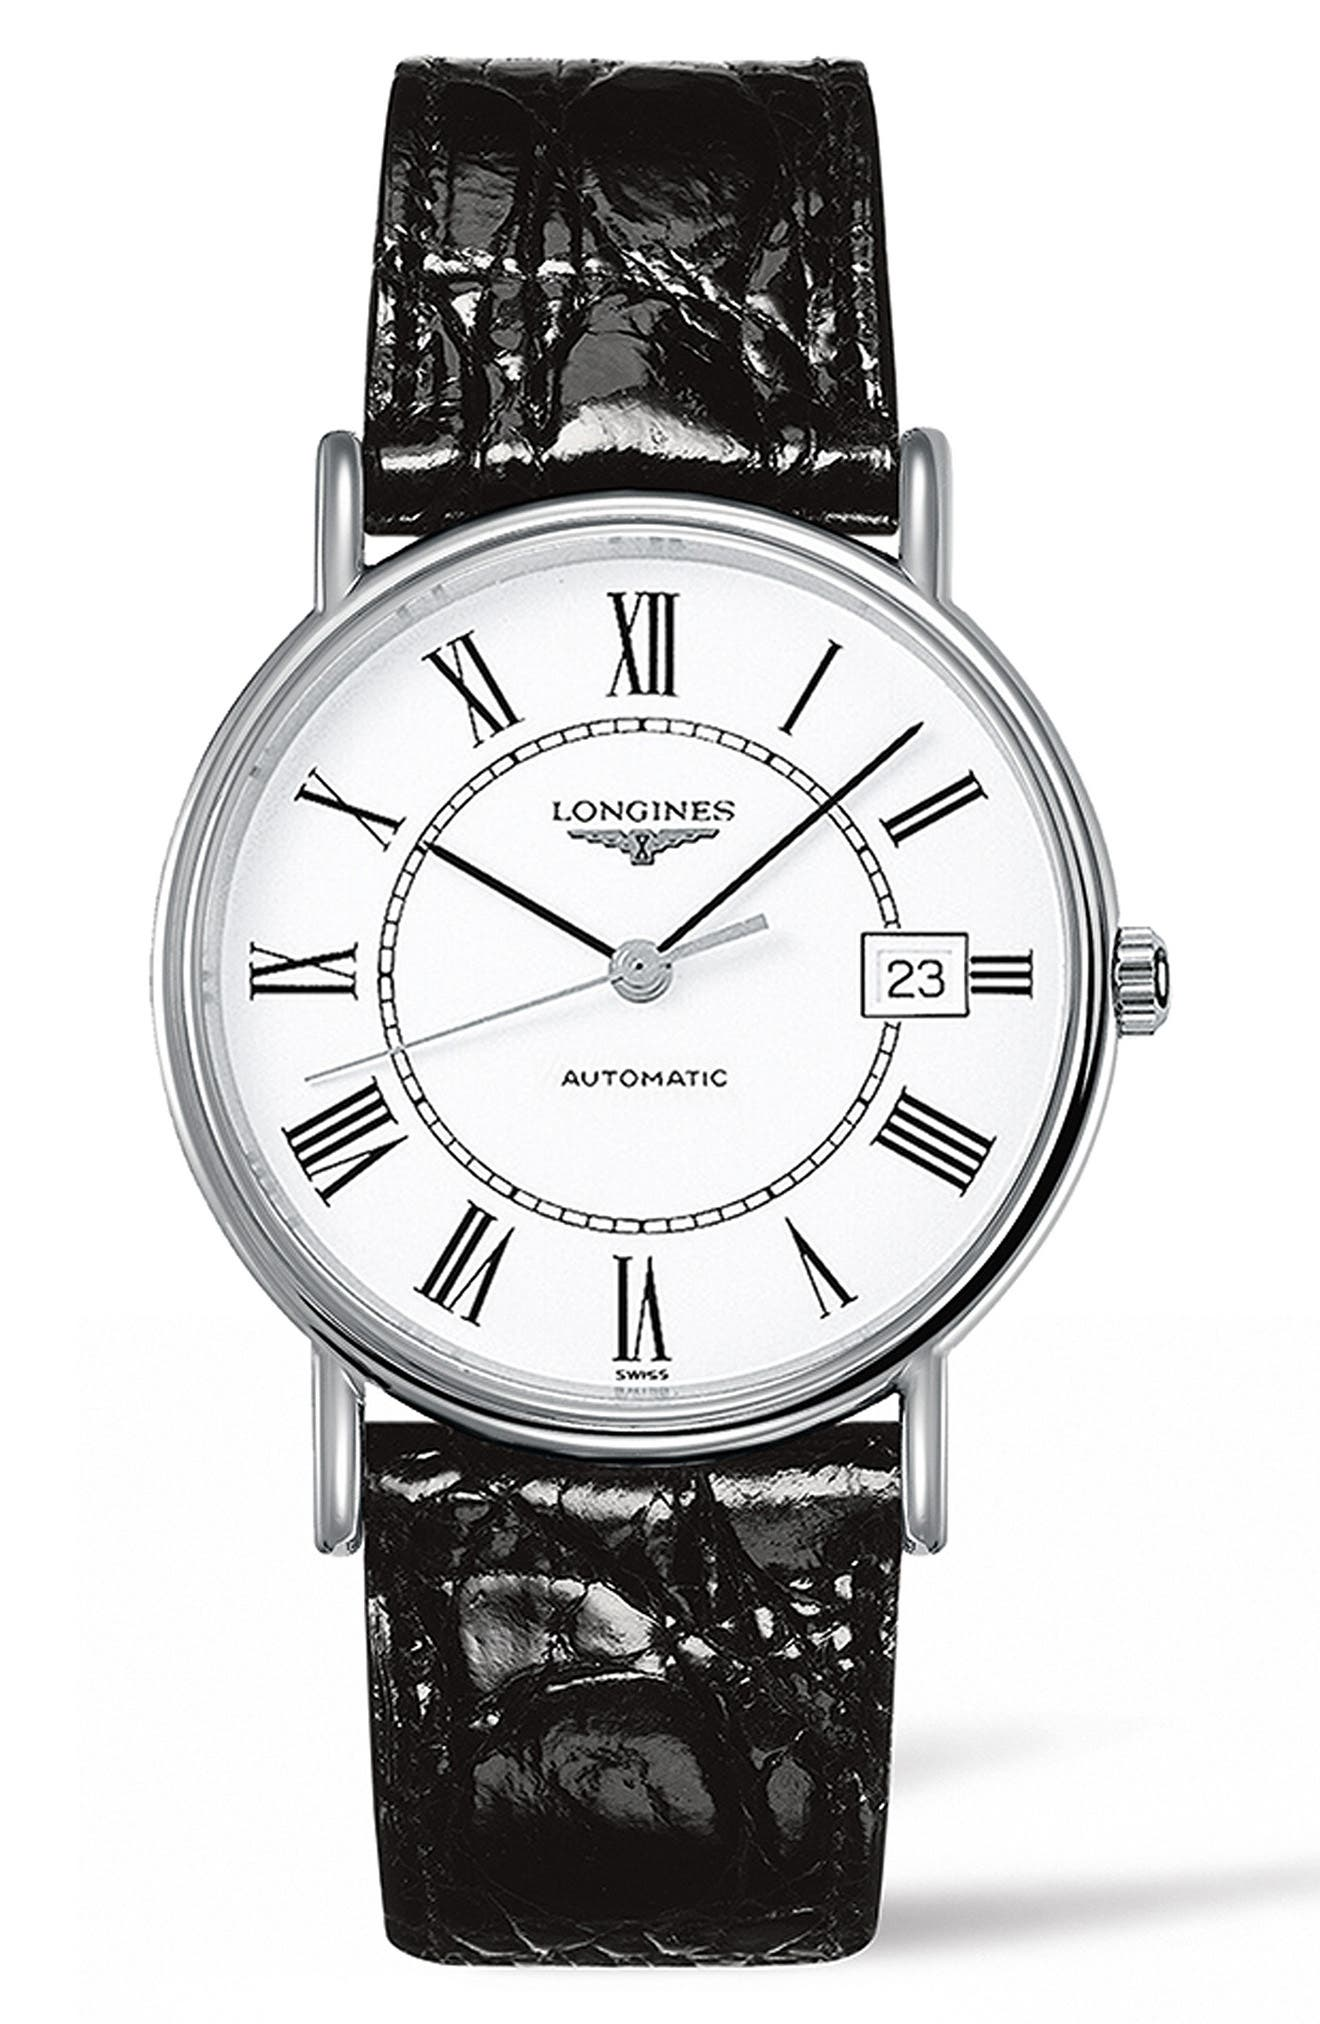 Presence Automatic Alligator Leather Strap Watch